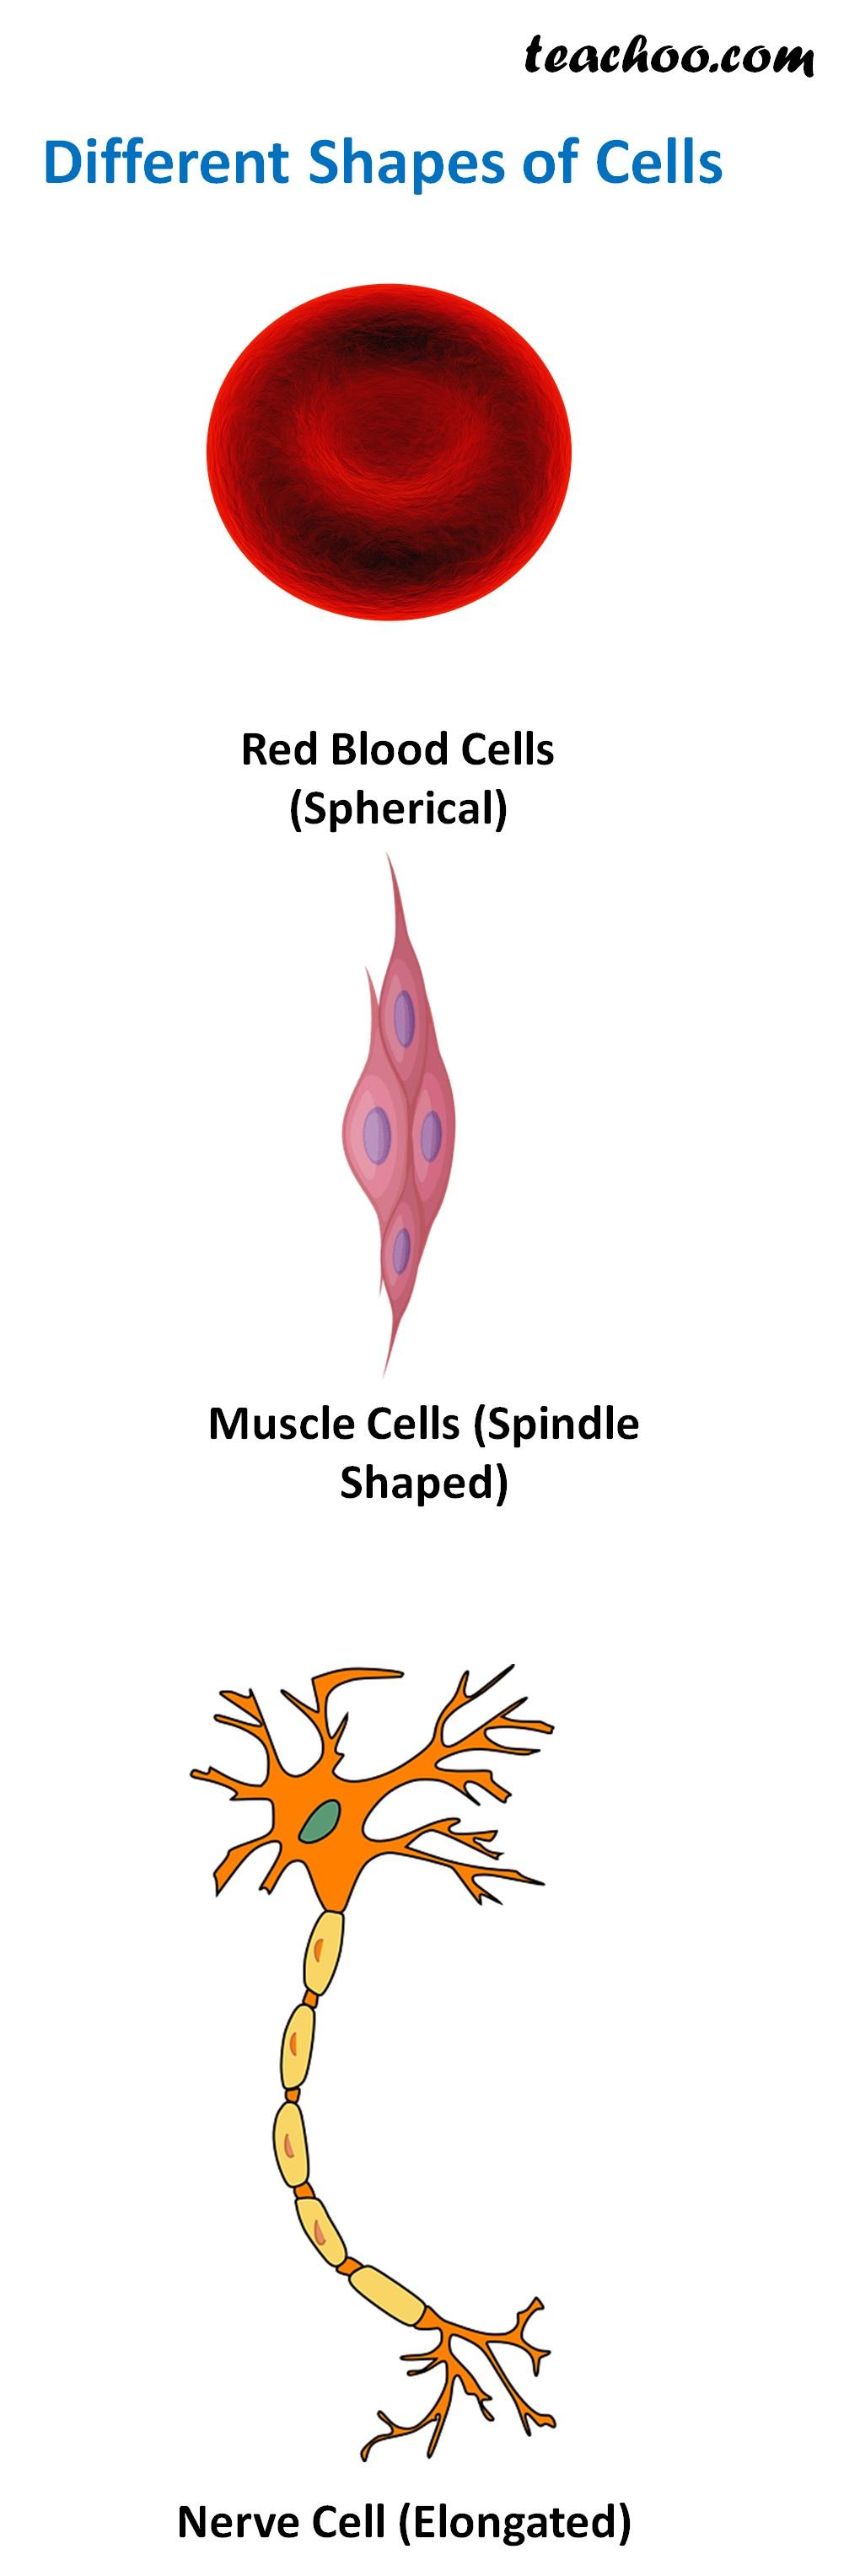 Different Shapes of Cells - Teachoo.jpg